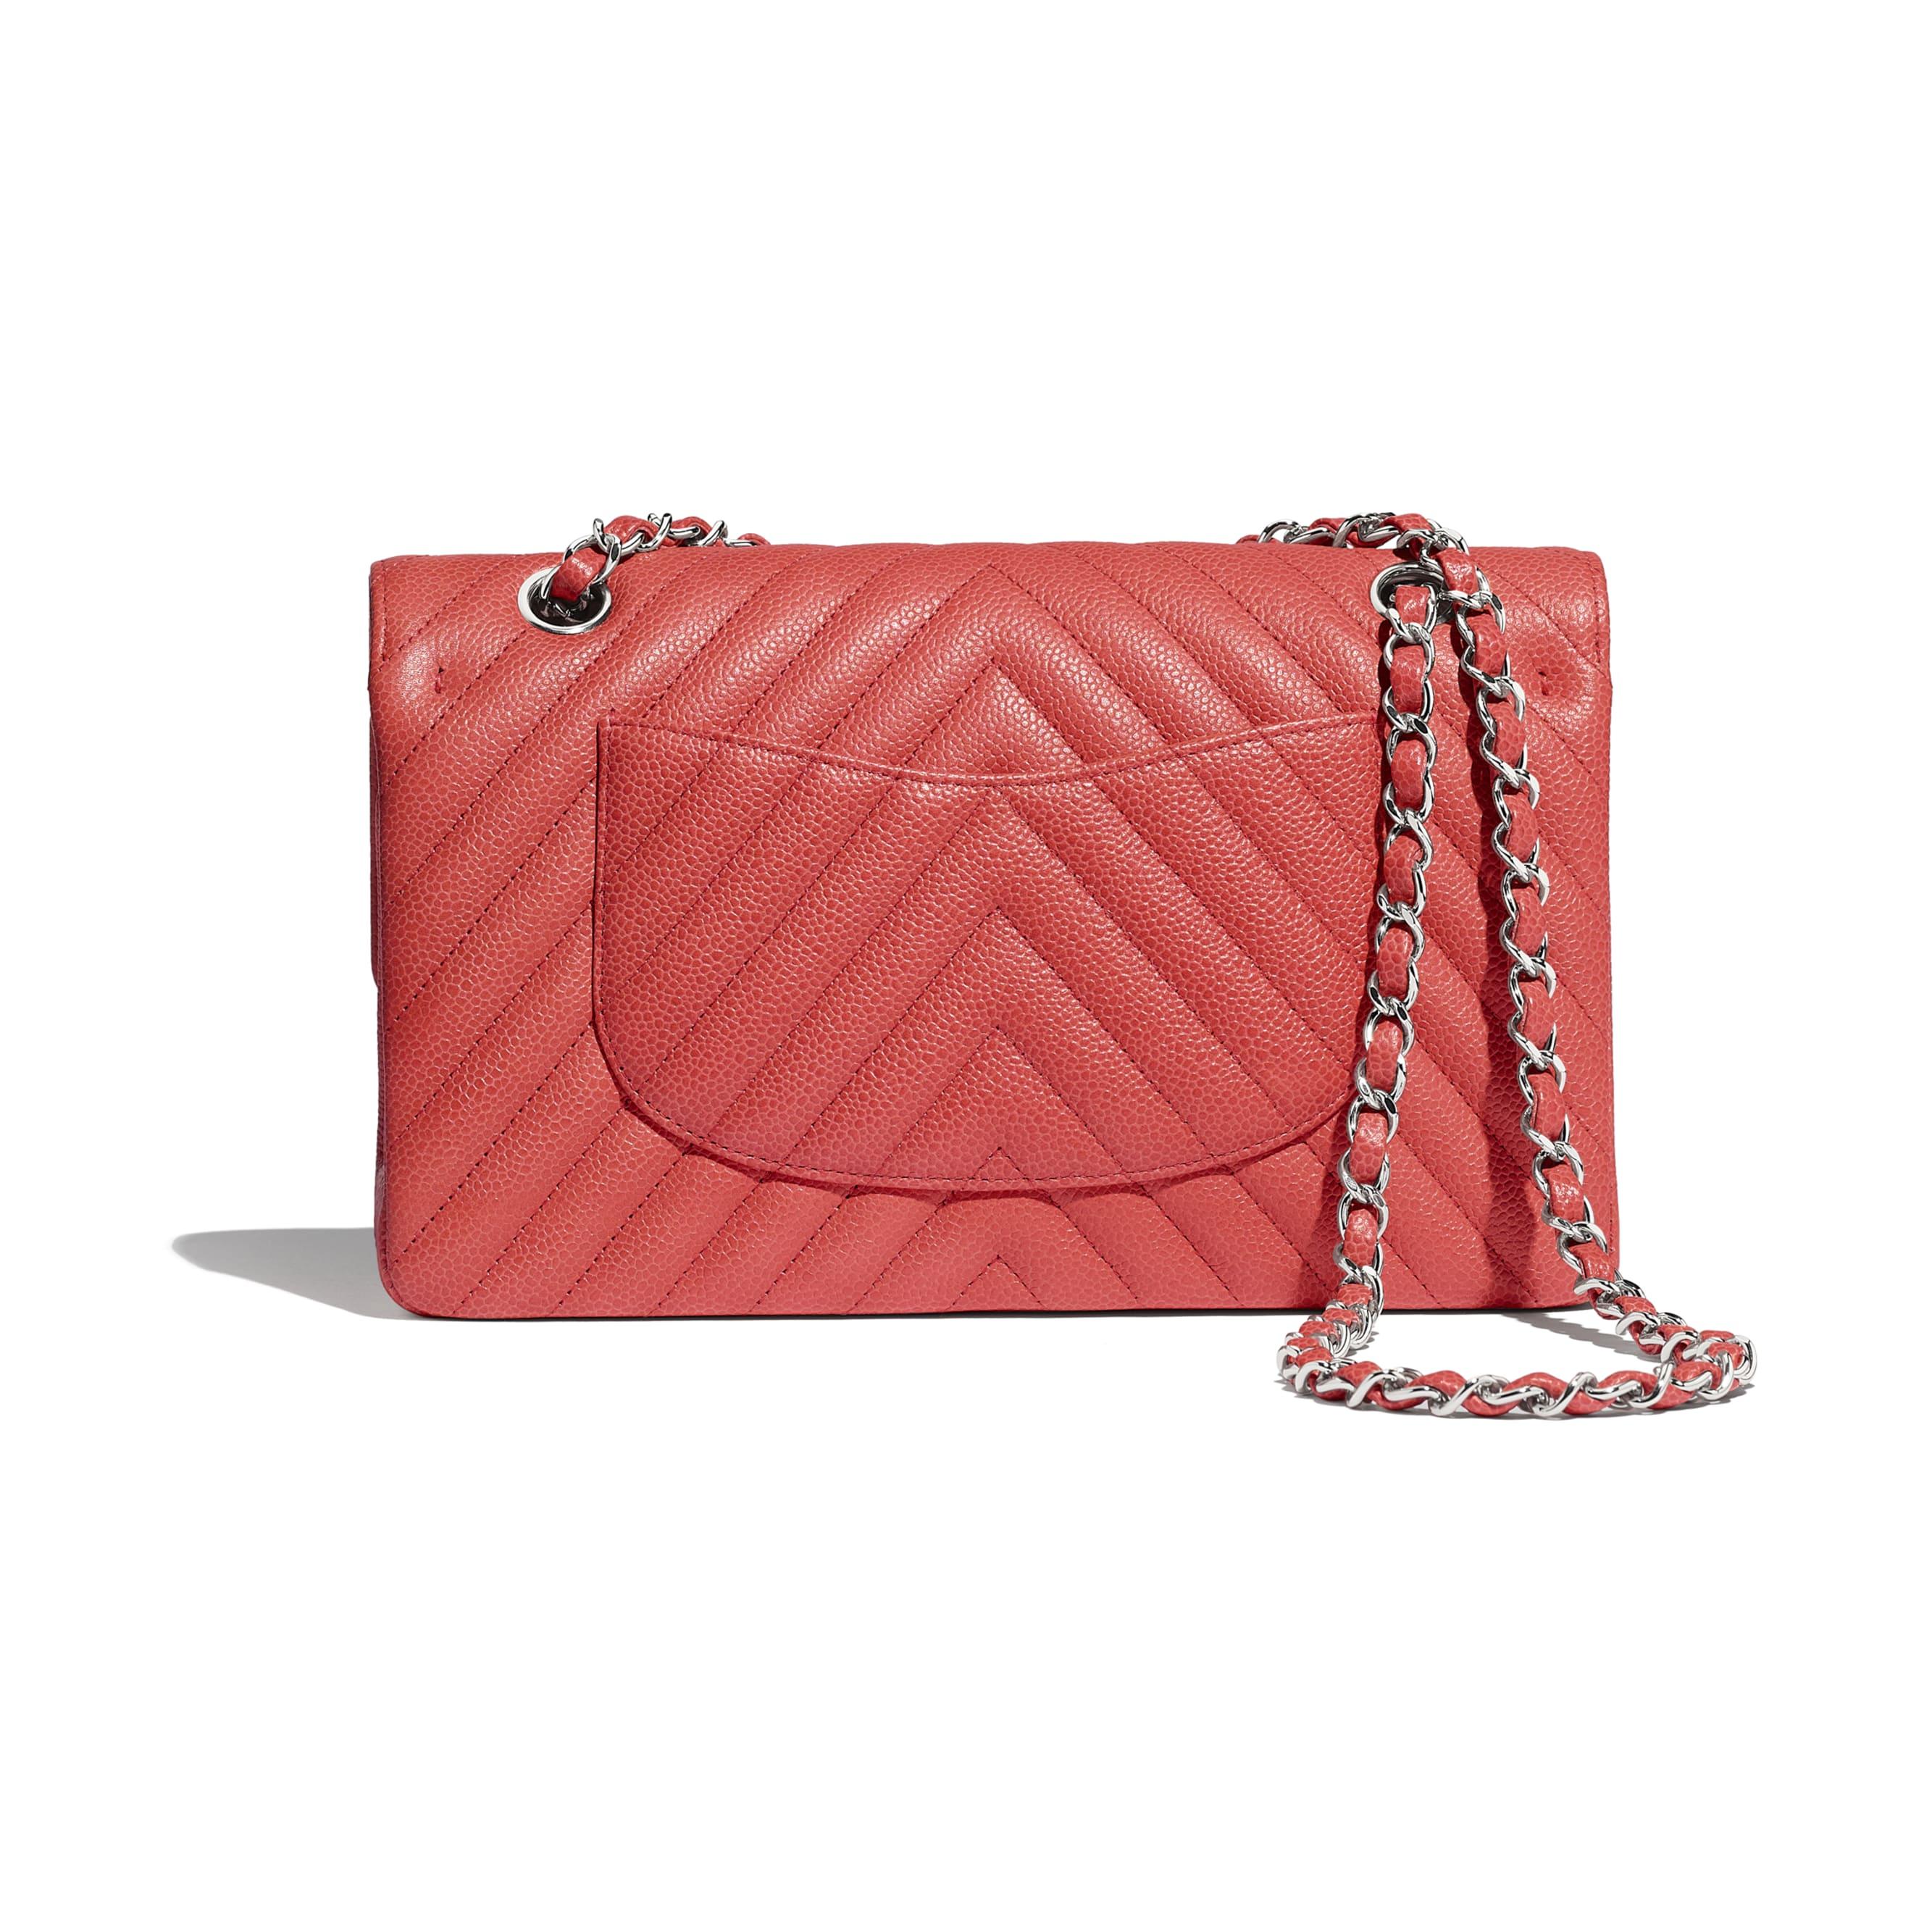 Classic Handbag - Coral - Grained Calfskin & Silver-Tone Metal - Alternative view - see standard sized version